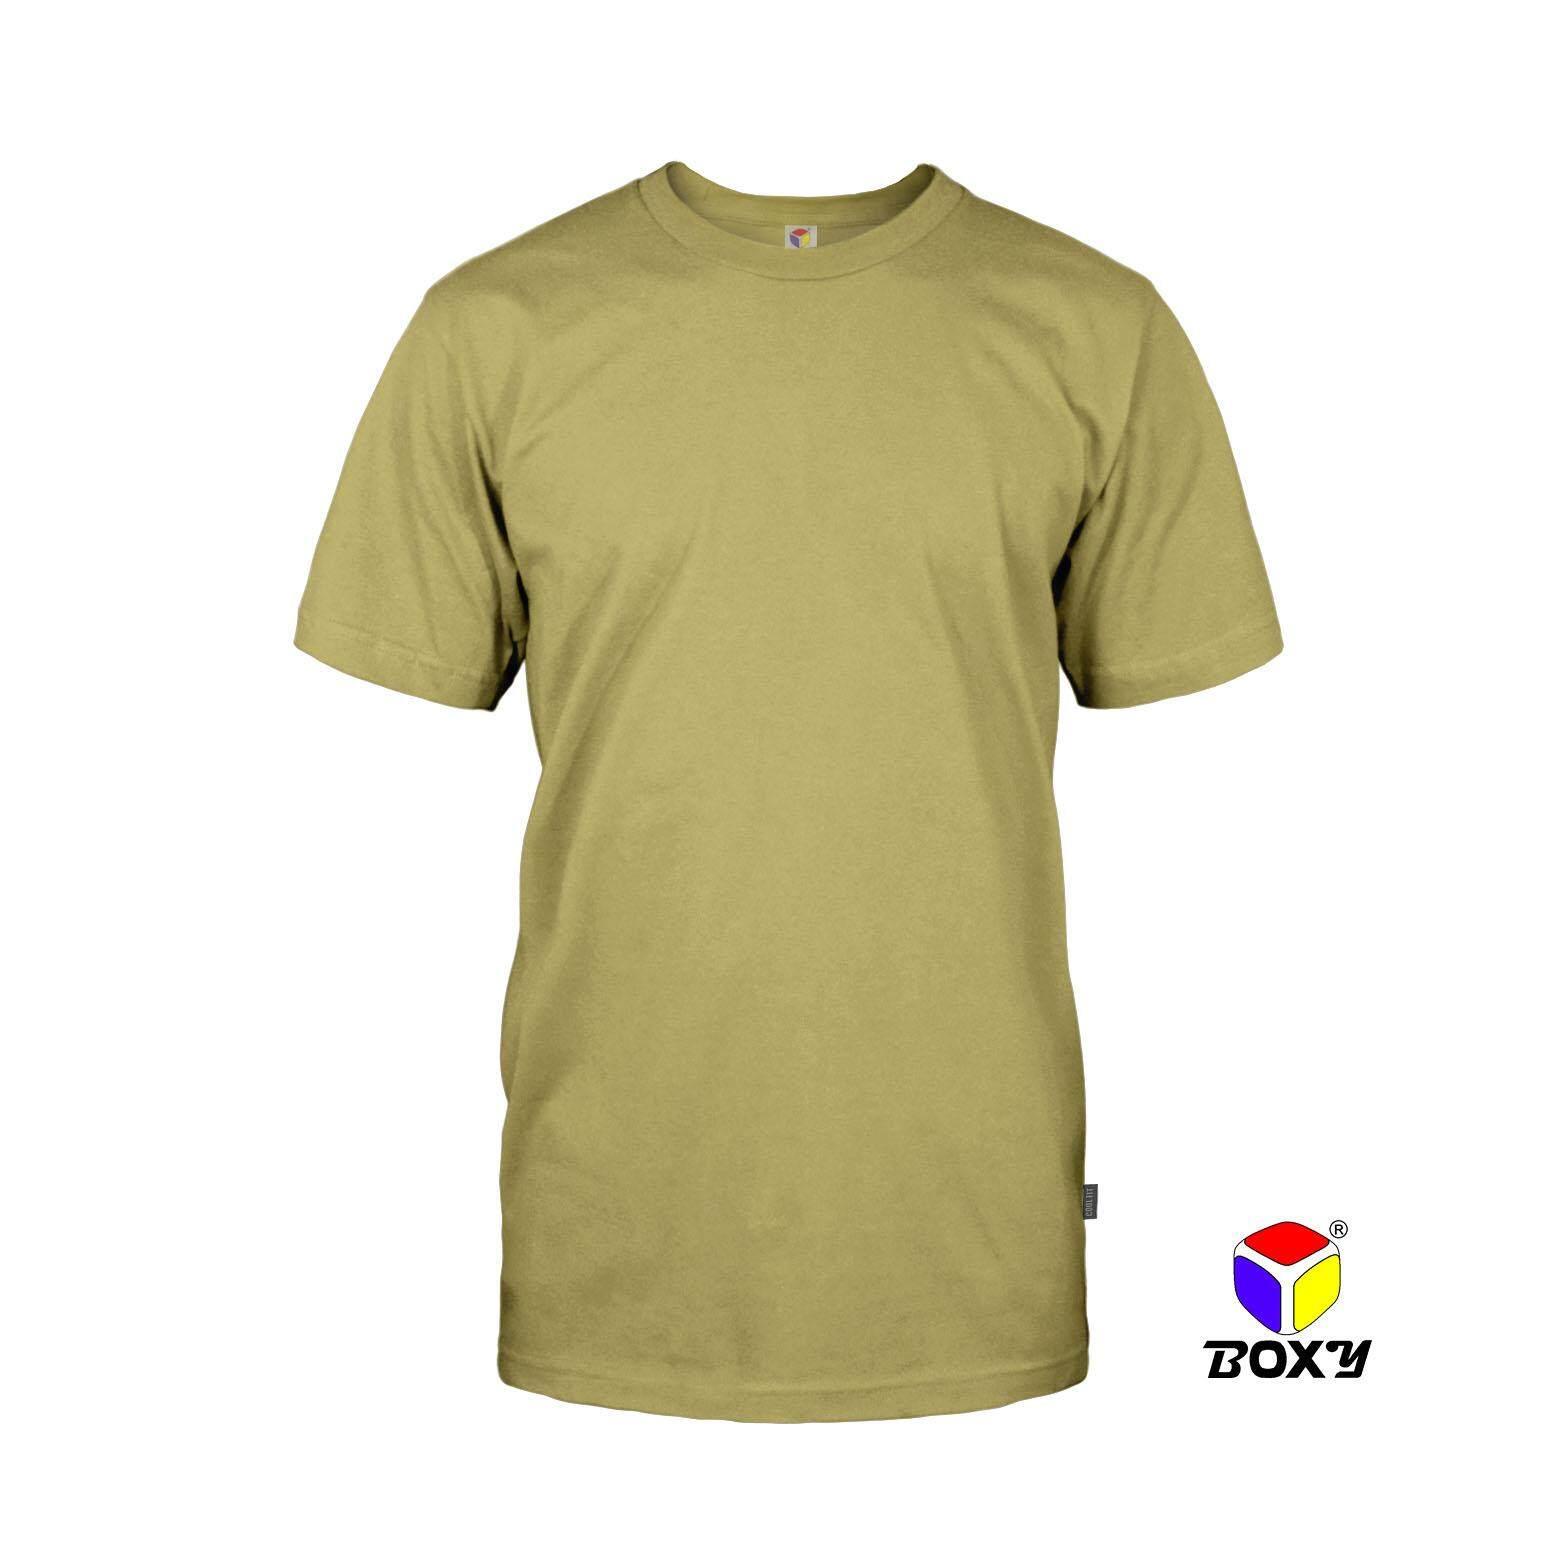 Popular T Shirts For Men The Best Prices In Malaysia De Michel Sandal Flat Wanita Princess Putih